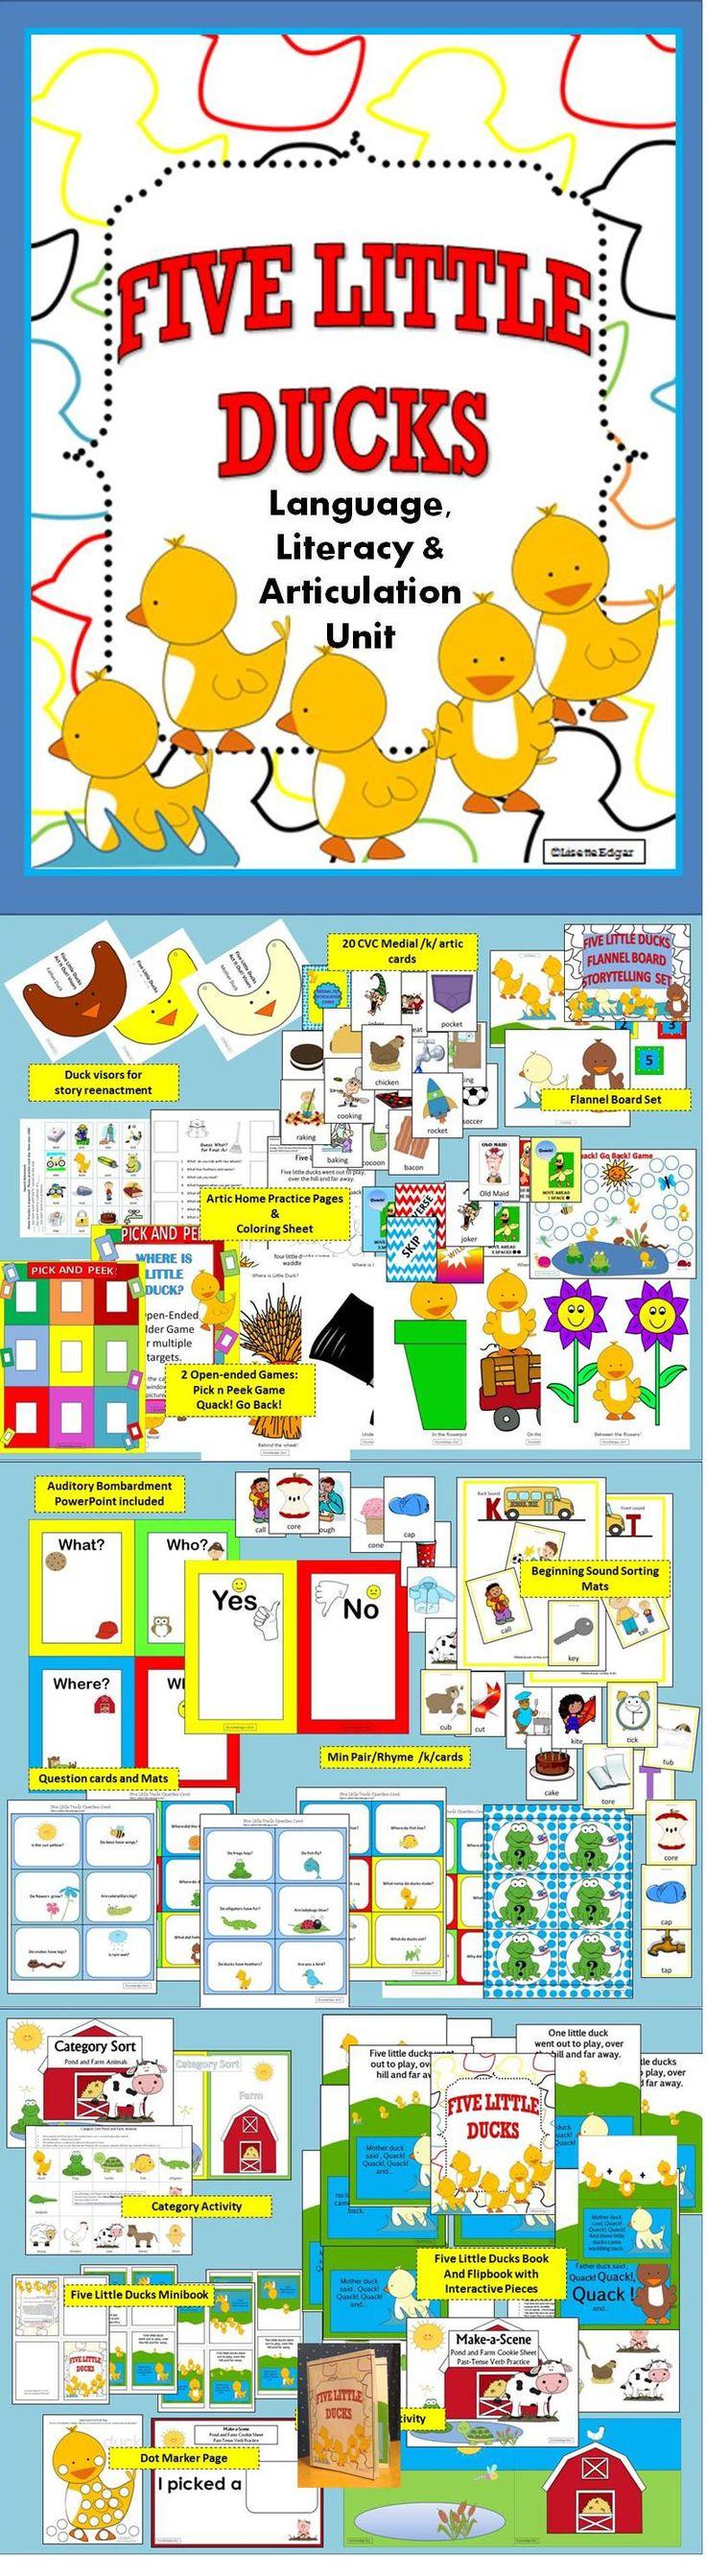 $ 15 activities to teach final /k/, spatial concepts, description, categorization and more! Includes Five Little Ducks Flipbook.